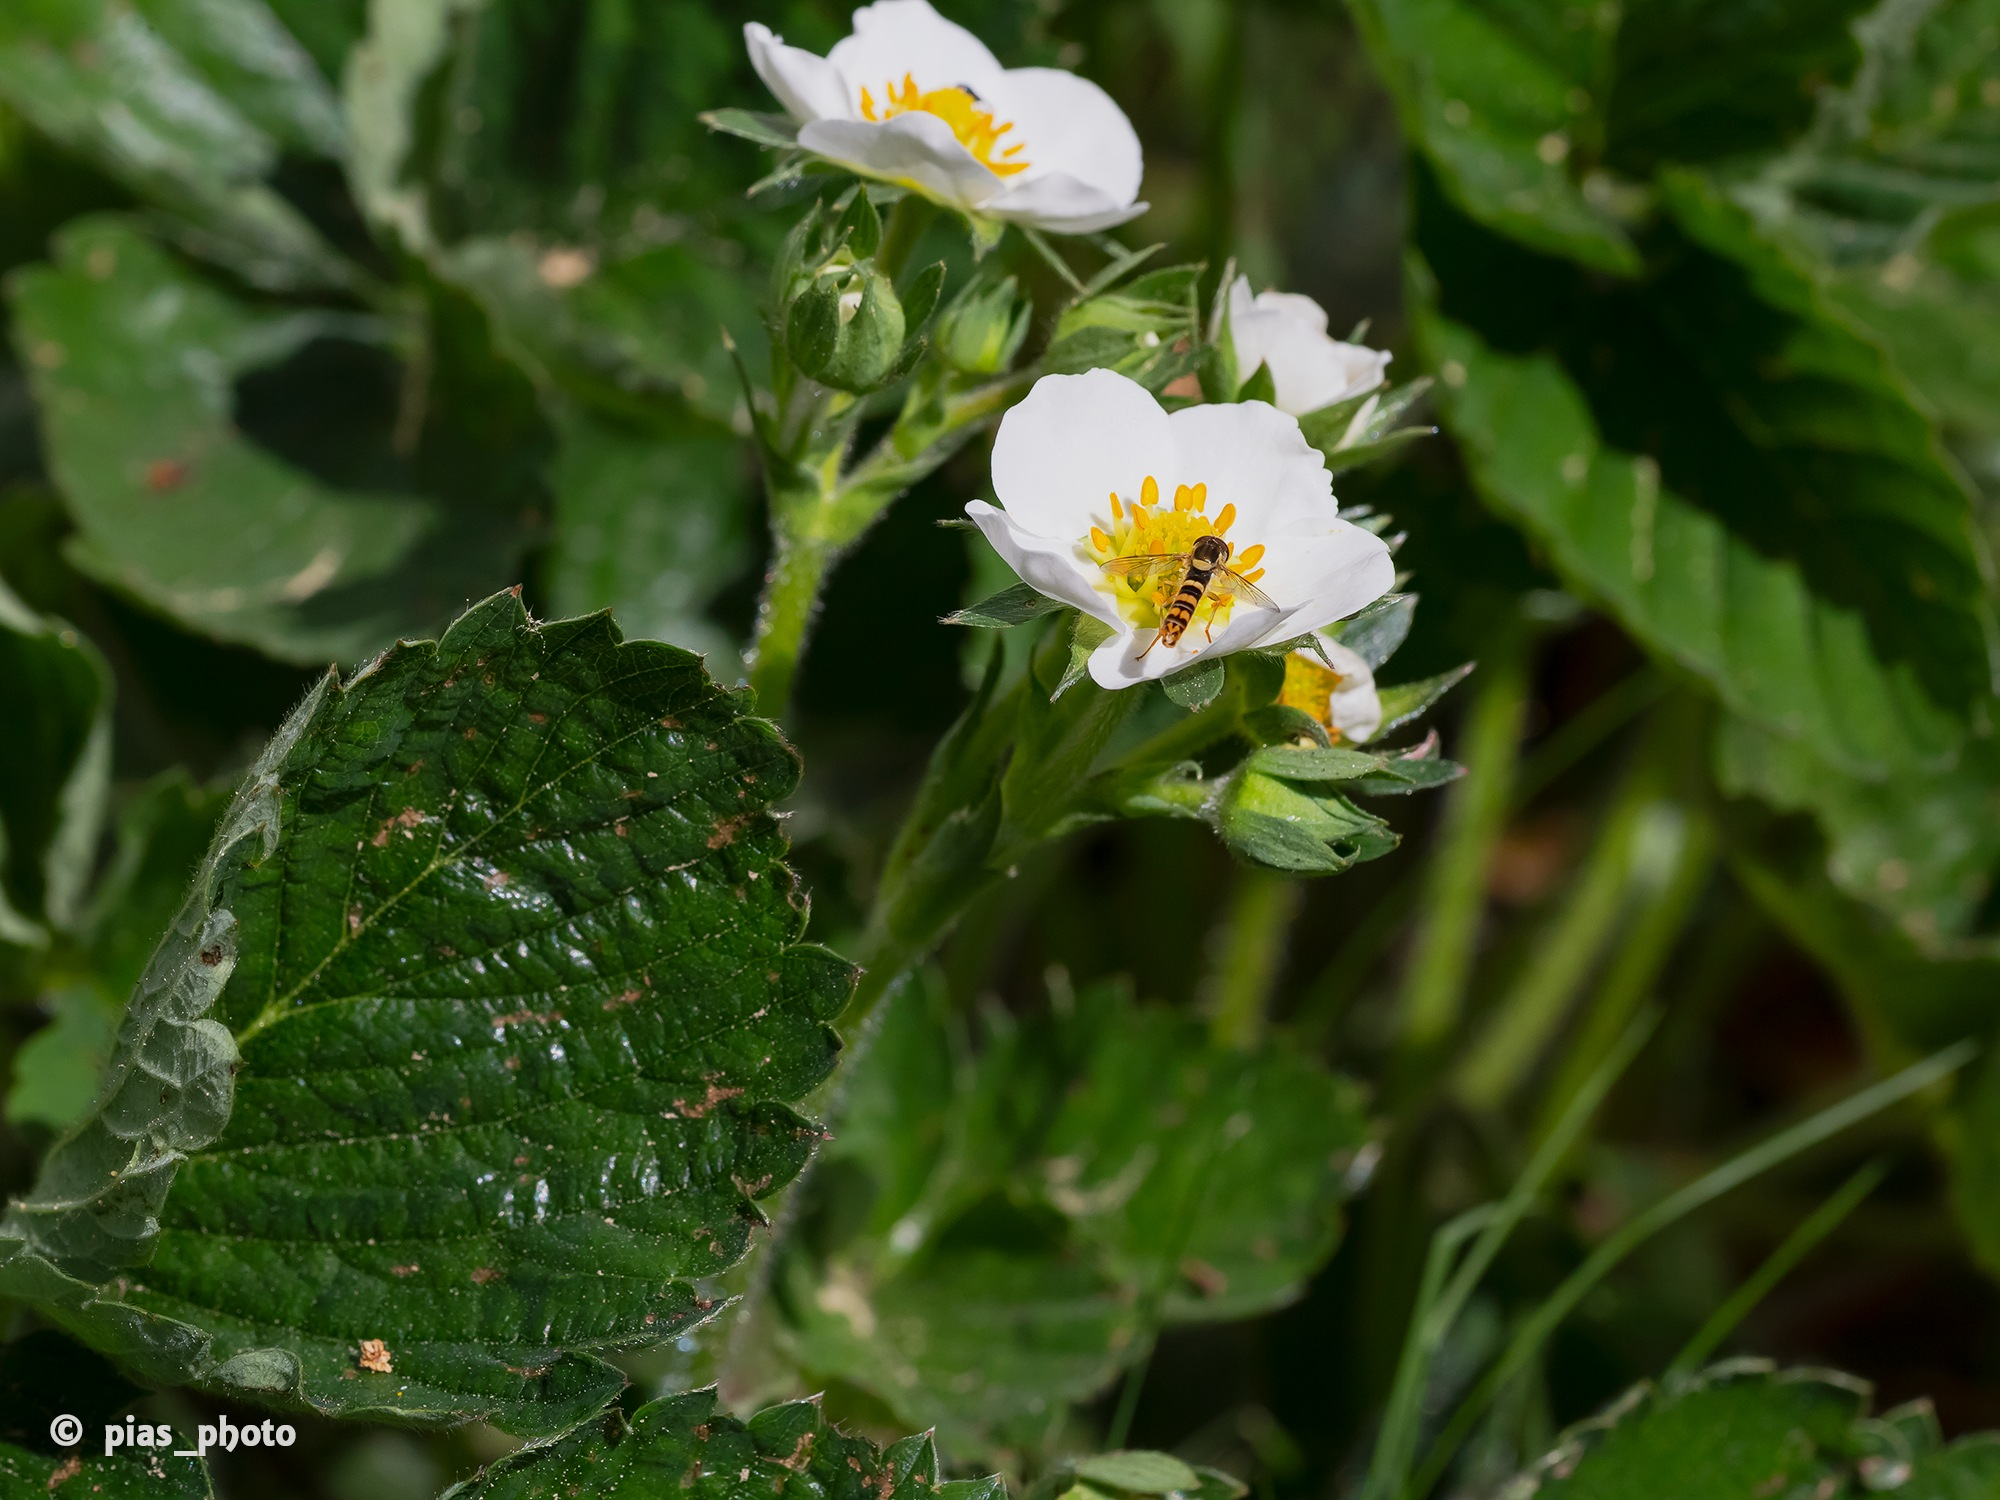 Blomfluga på jordgubbsblom by pias_photo